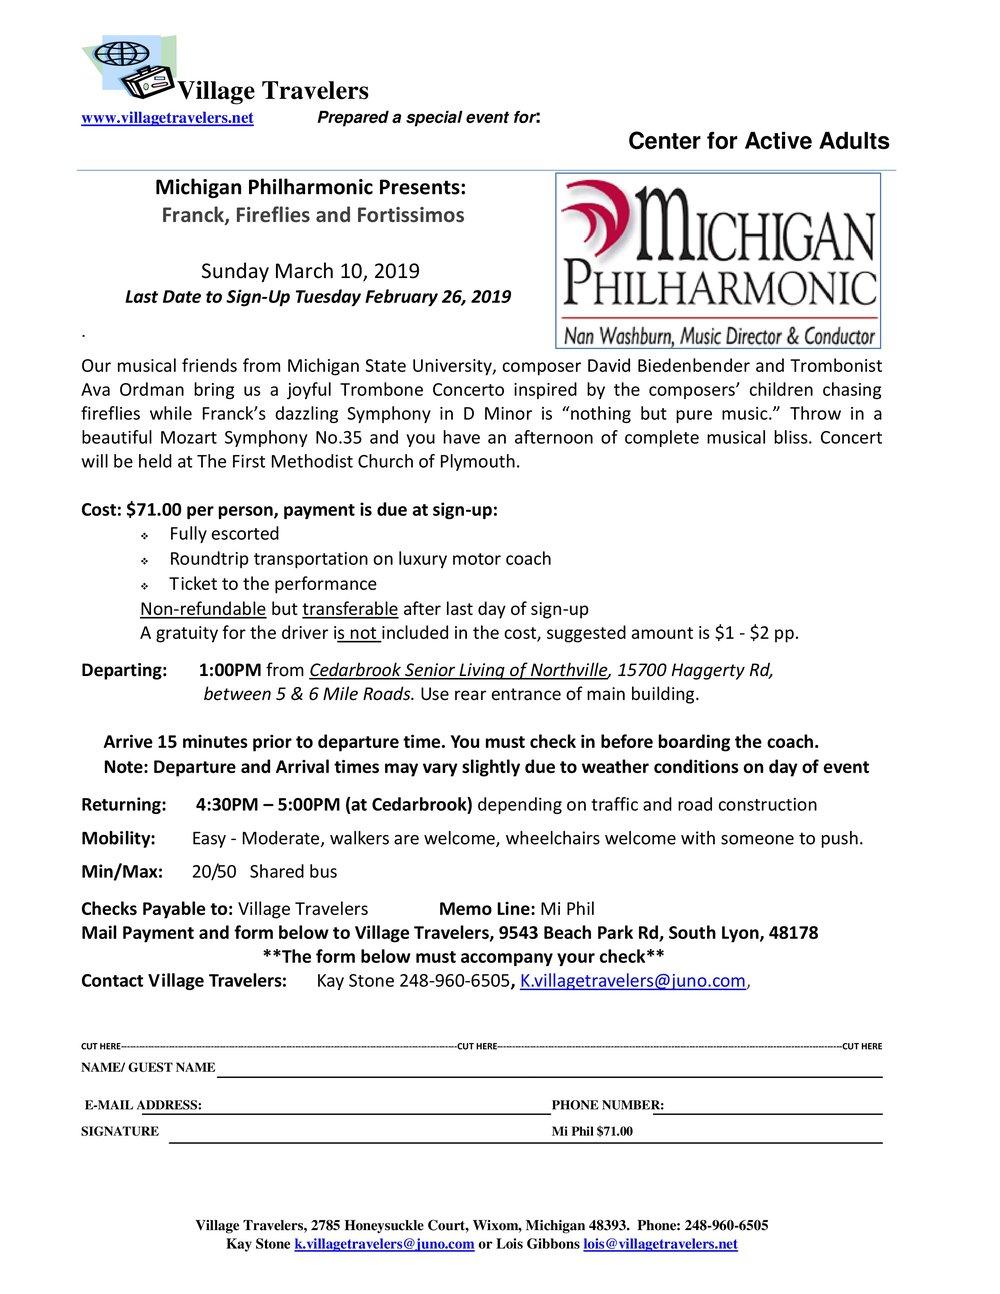 Michigan Philharmonic Presents: Franck, Fireflies, and Fortissimos